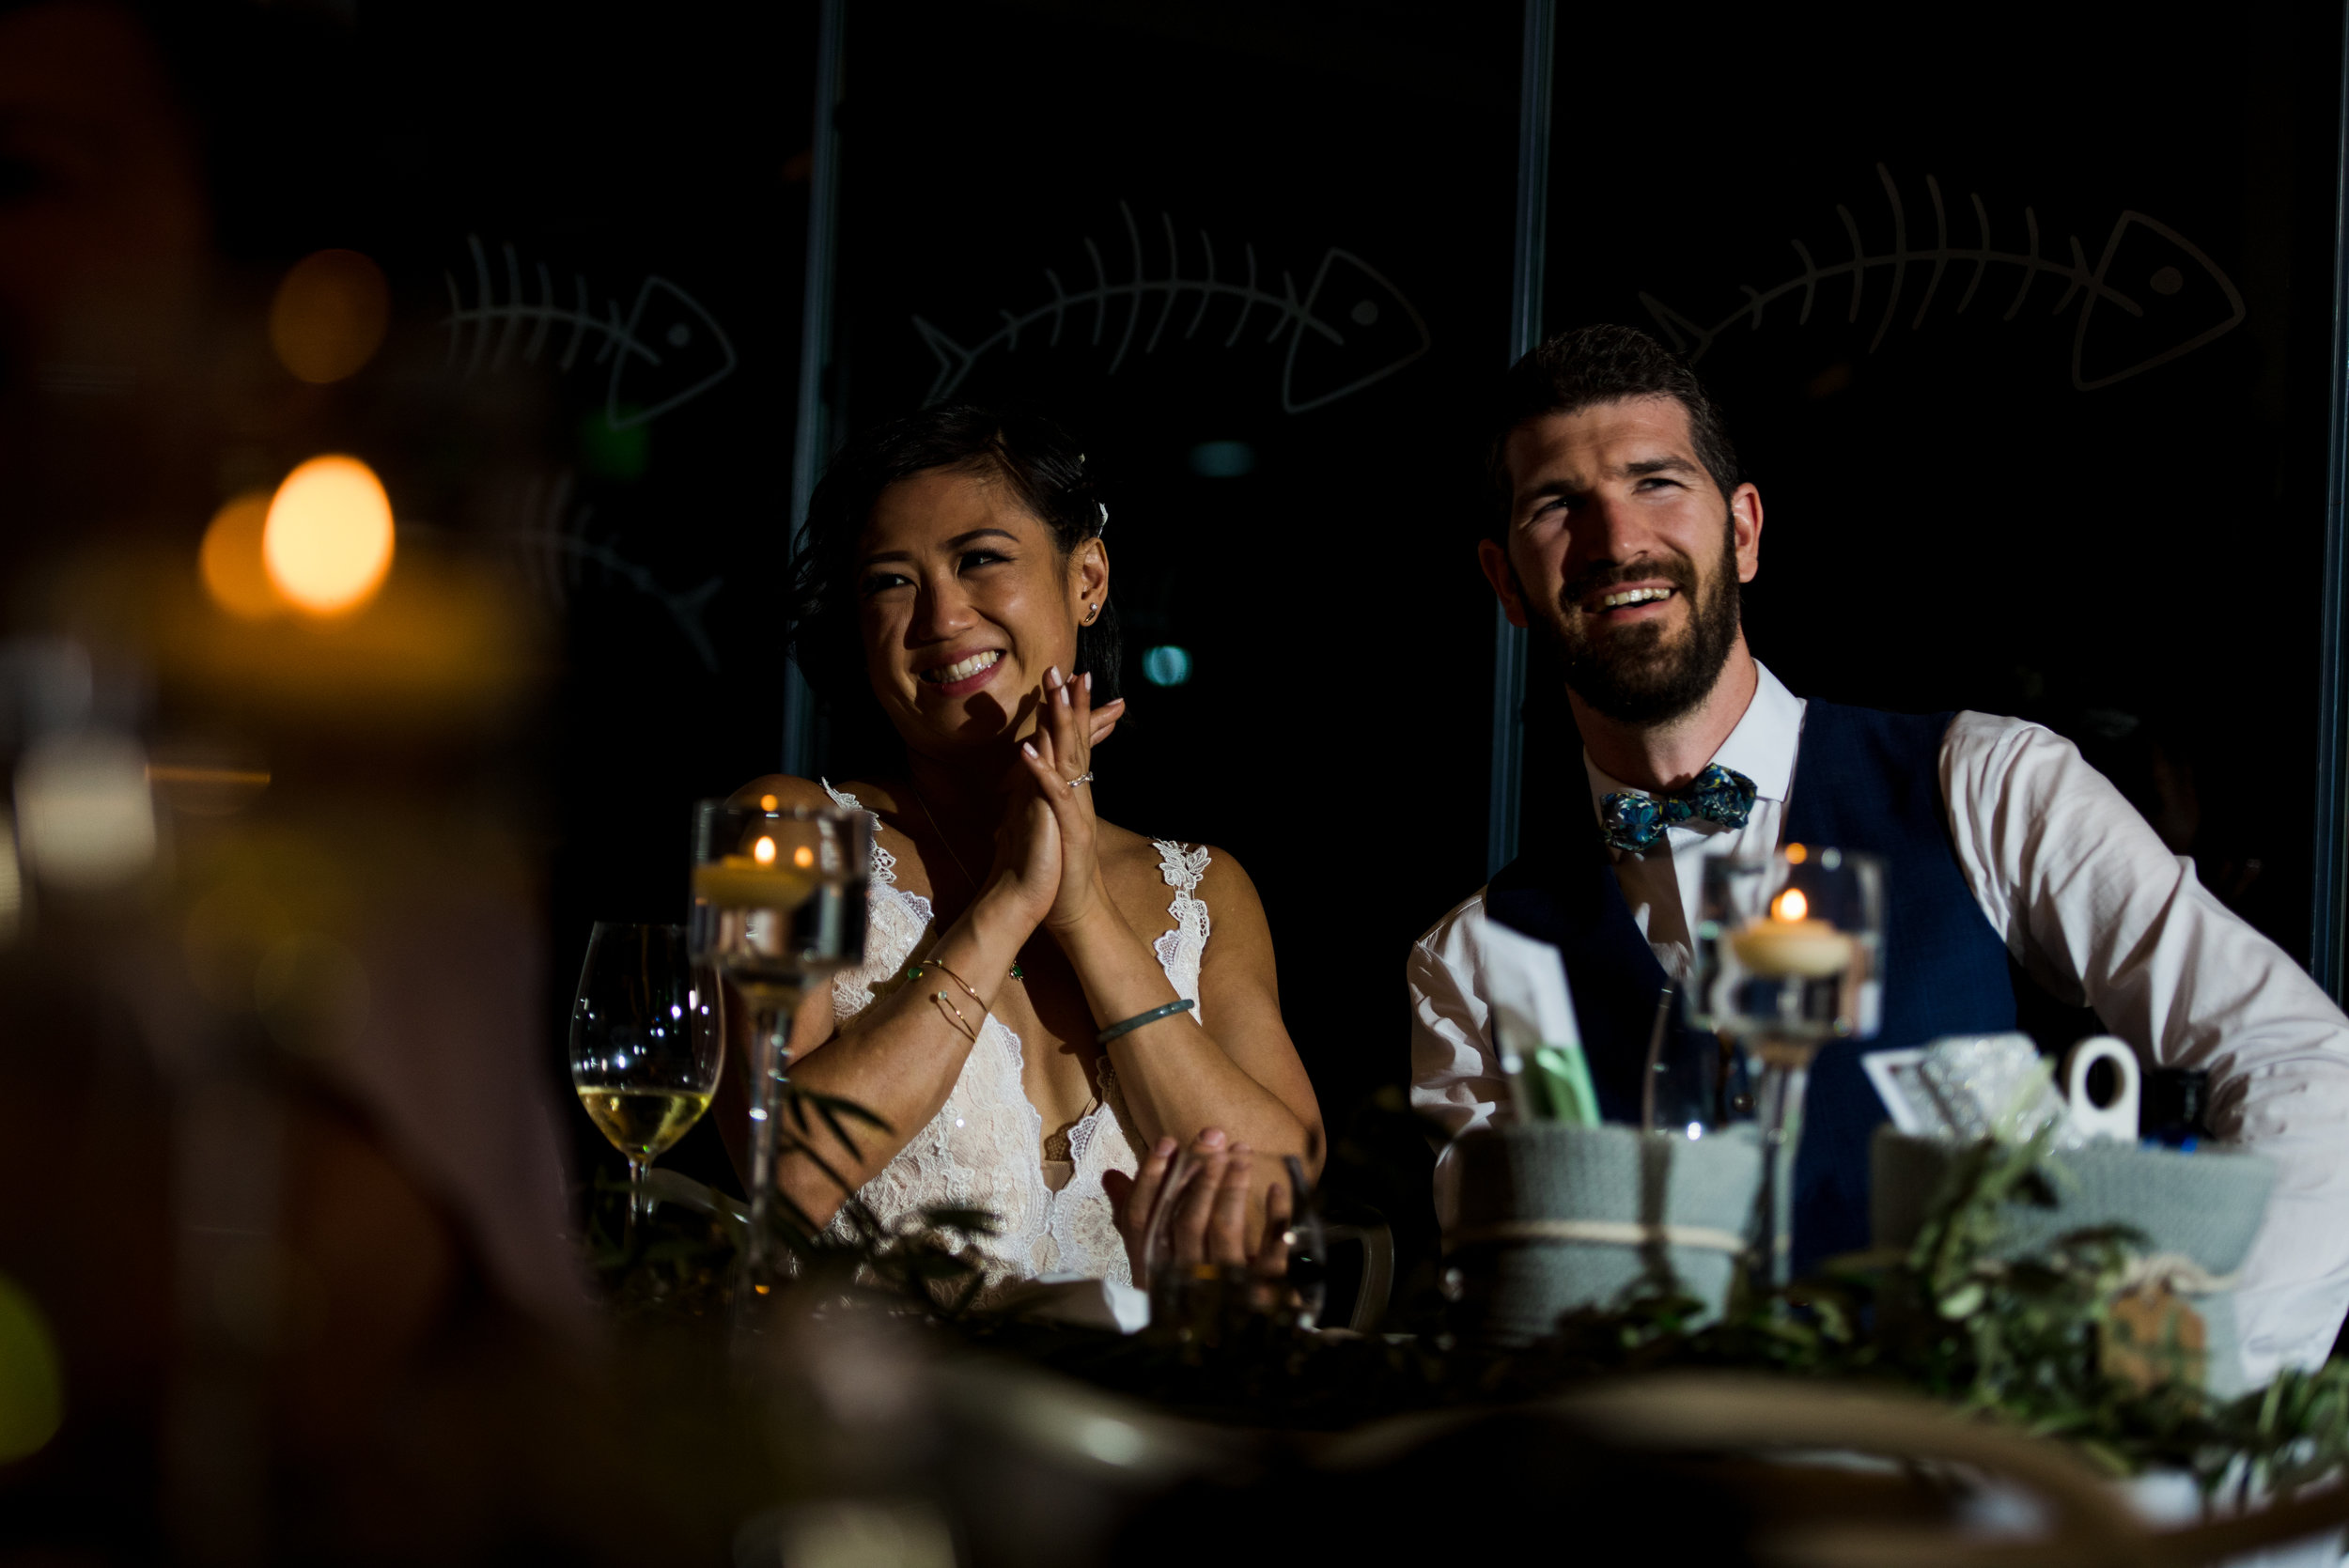 minty-frank-wedding-favorites-200.jpg